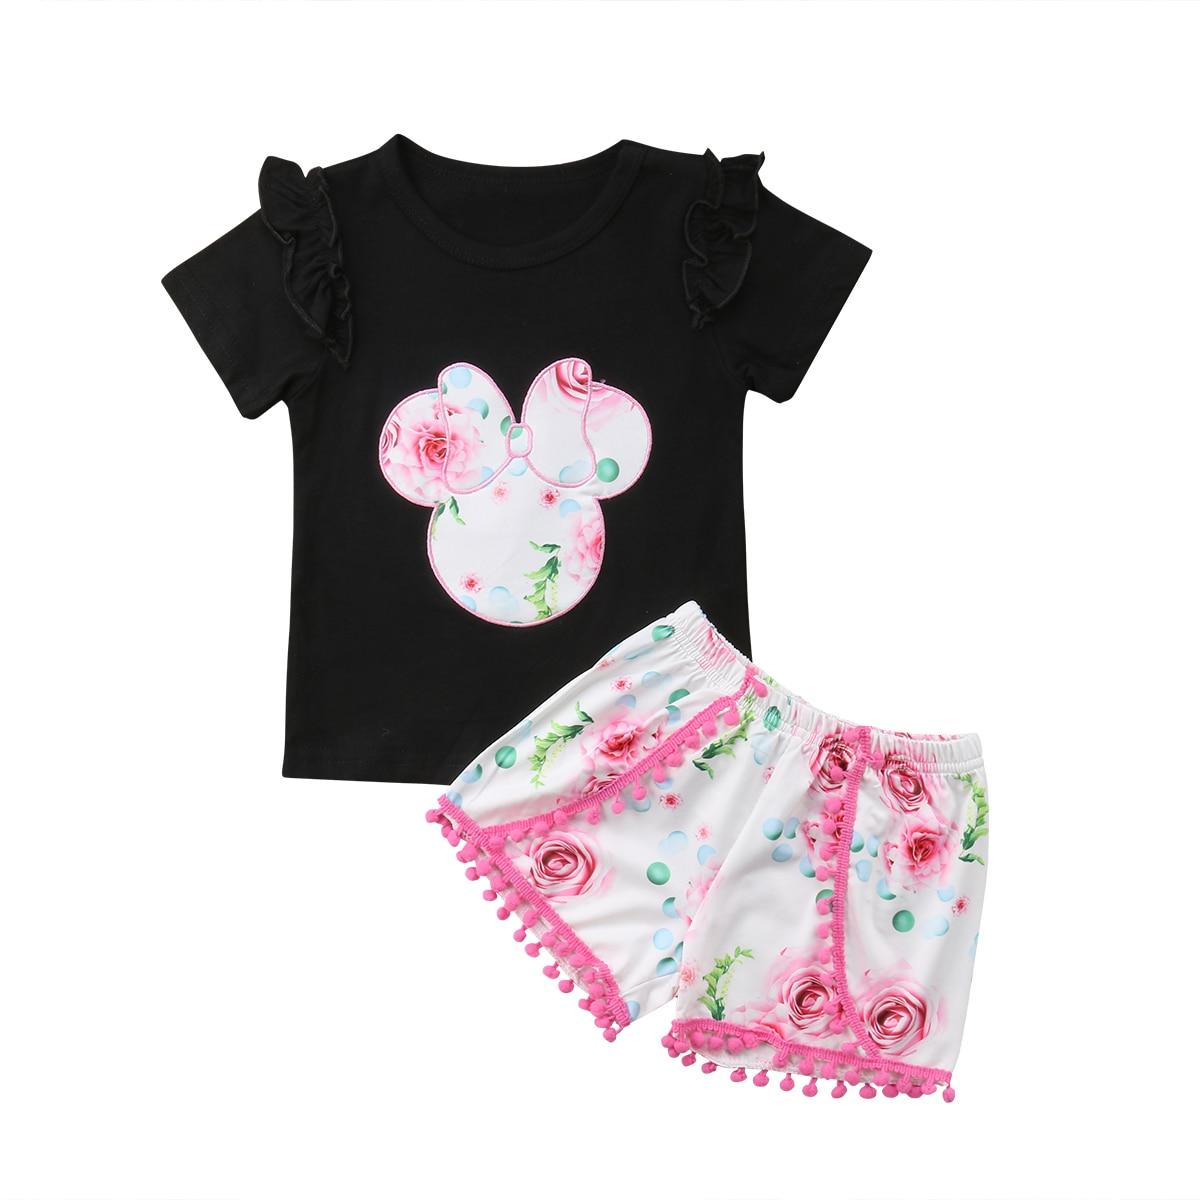 rechange Baby Girls Shorts Set Short Sleeves Letter Print Tassel Black T-Shirt Top Stripe Short Pants 2Pcs Outfits